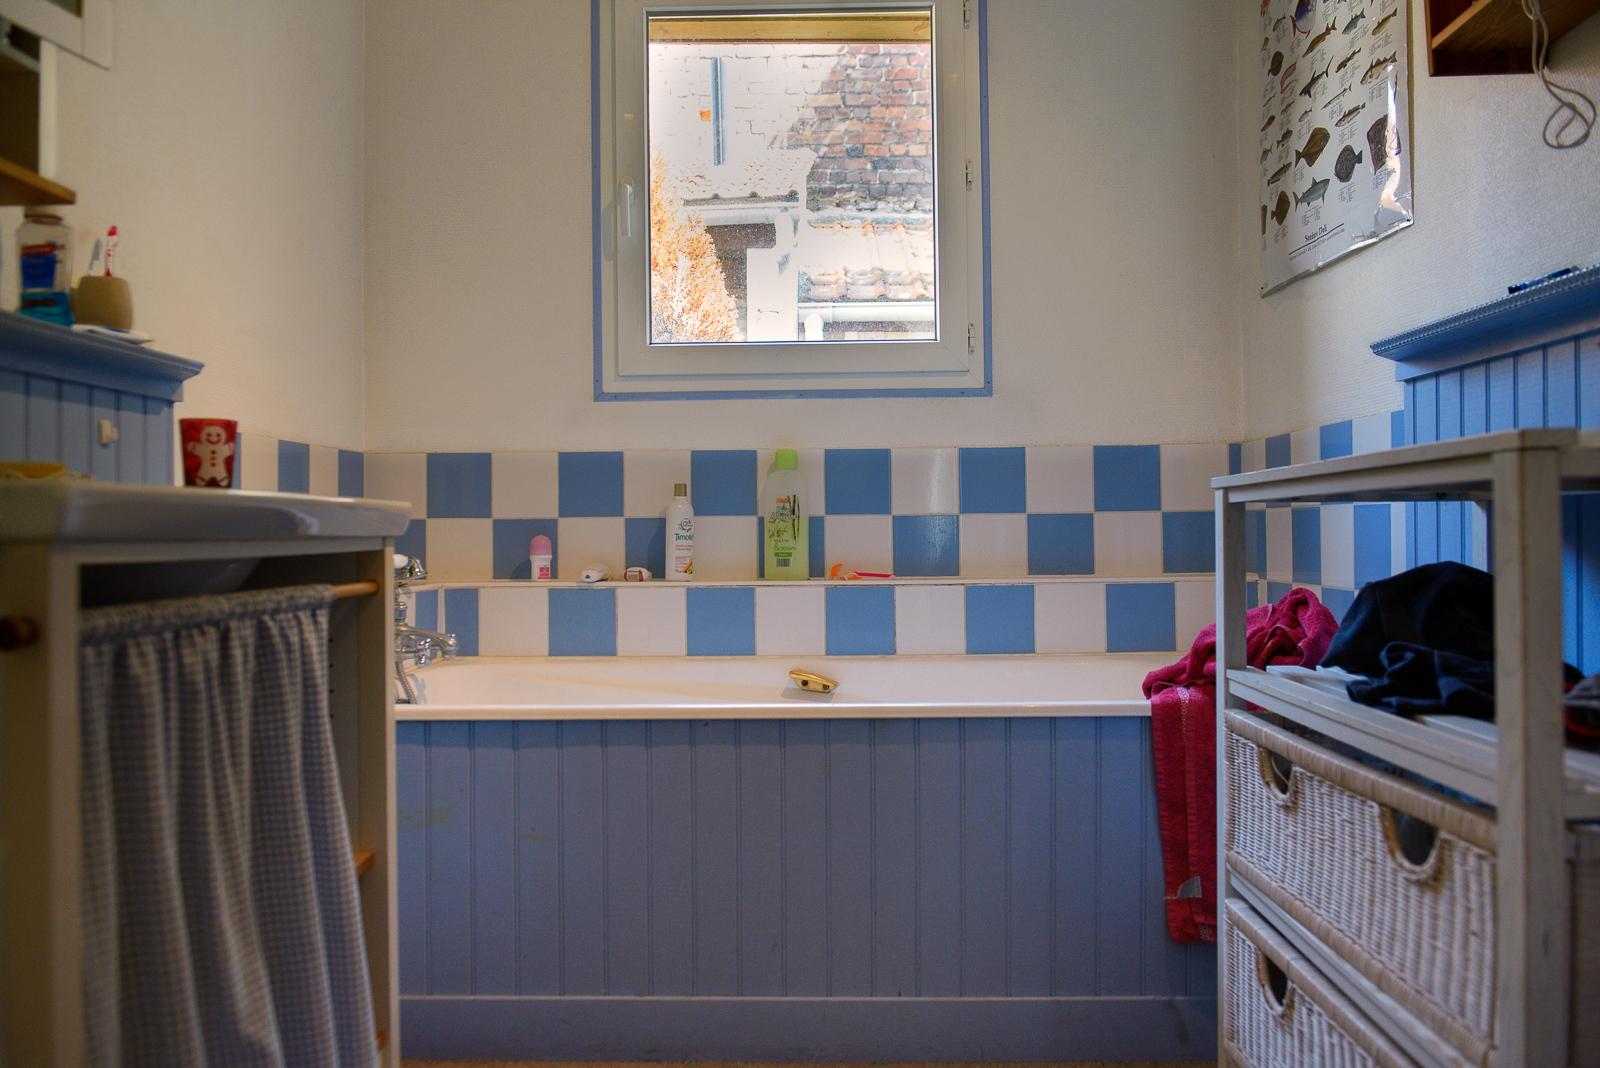 (EN) August 25, 2017 - Calais, France. The owner of this bathroom has been hosting migrants for 5 years and provides an average of 42 showers a week. (ES)25 de agosto de 2017 - Calais, Francia. El propietario de este baño ha sido anfitrión de migrantes durante 5 años y proporciona un promedio de 42 duchas por semana. (FR) 25 août 2017 - Calais, France. Le propriétaire de cette salle de bain accueille des exilé(e)s depuis 5 ans et fournit gratuitement en moyenne 42 par semaine.